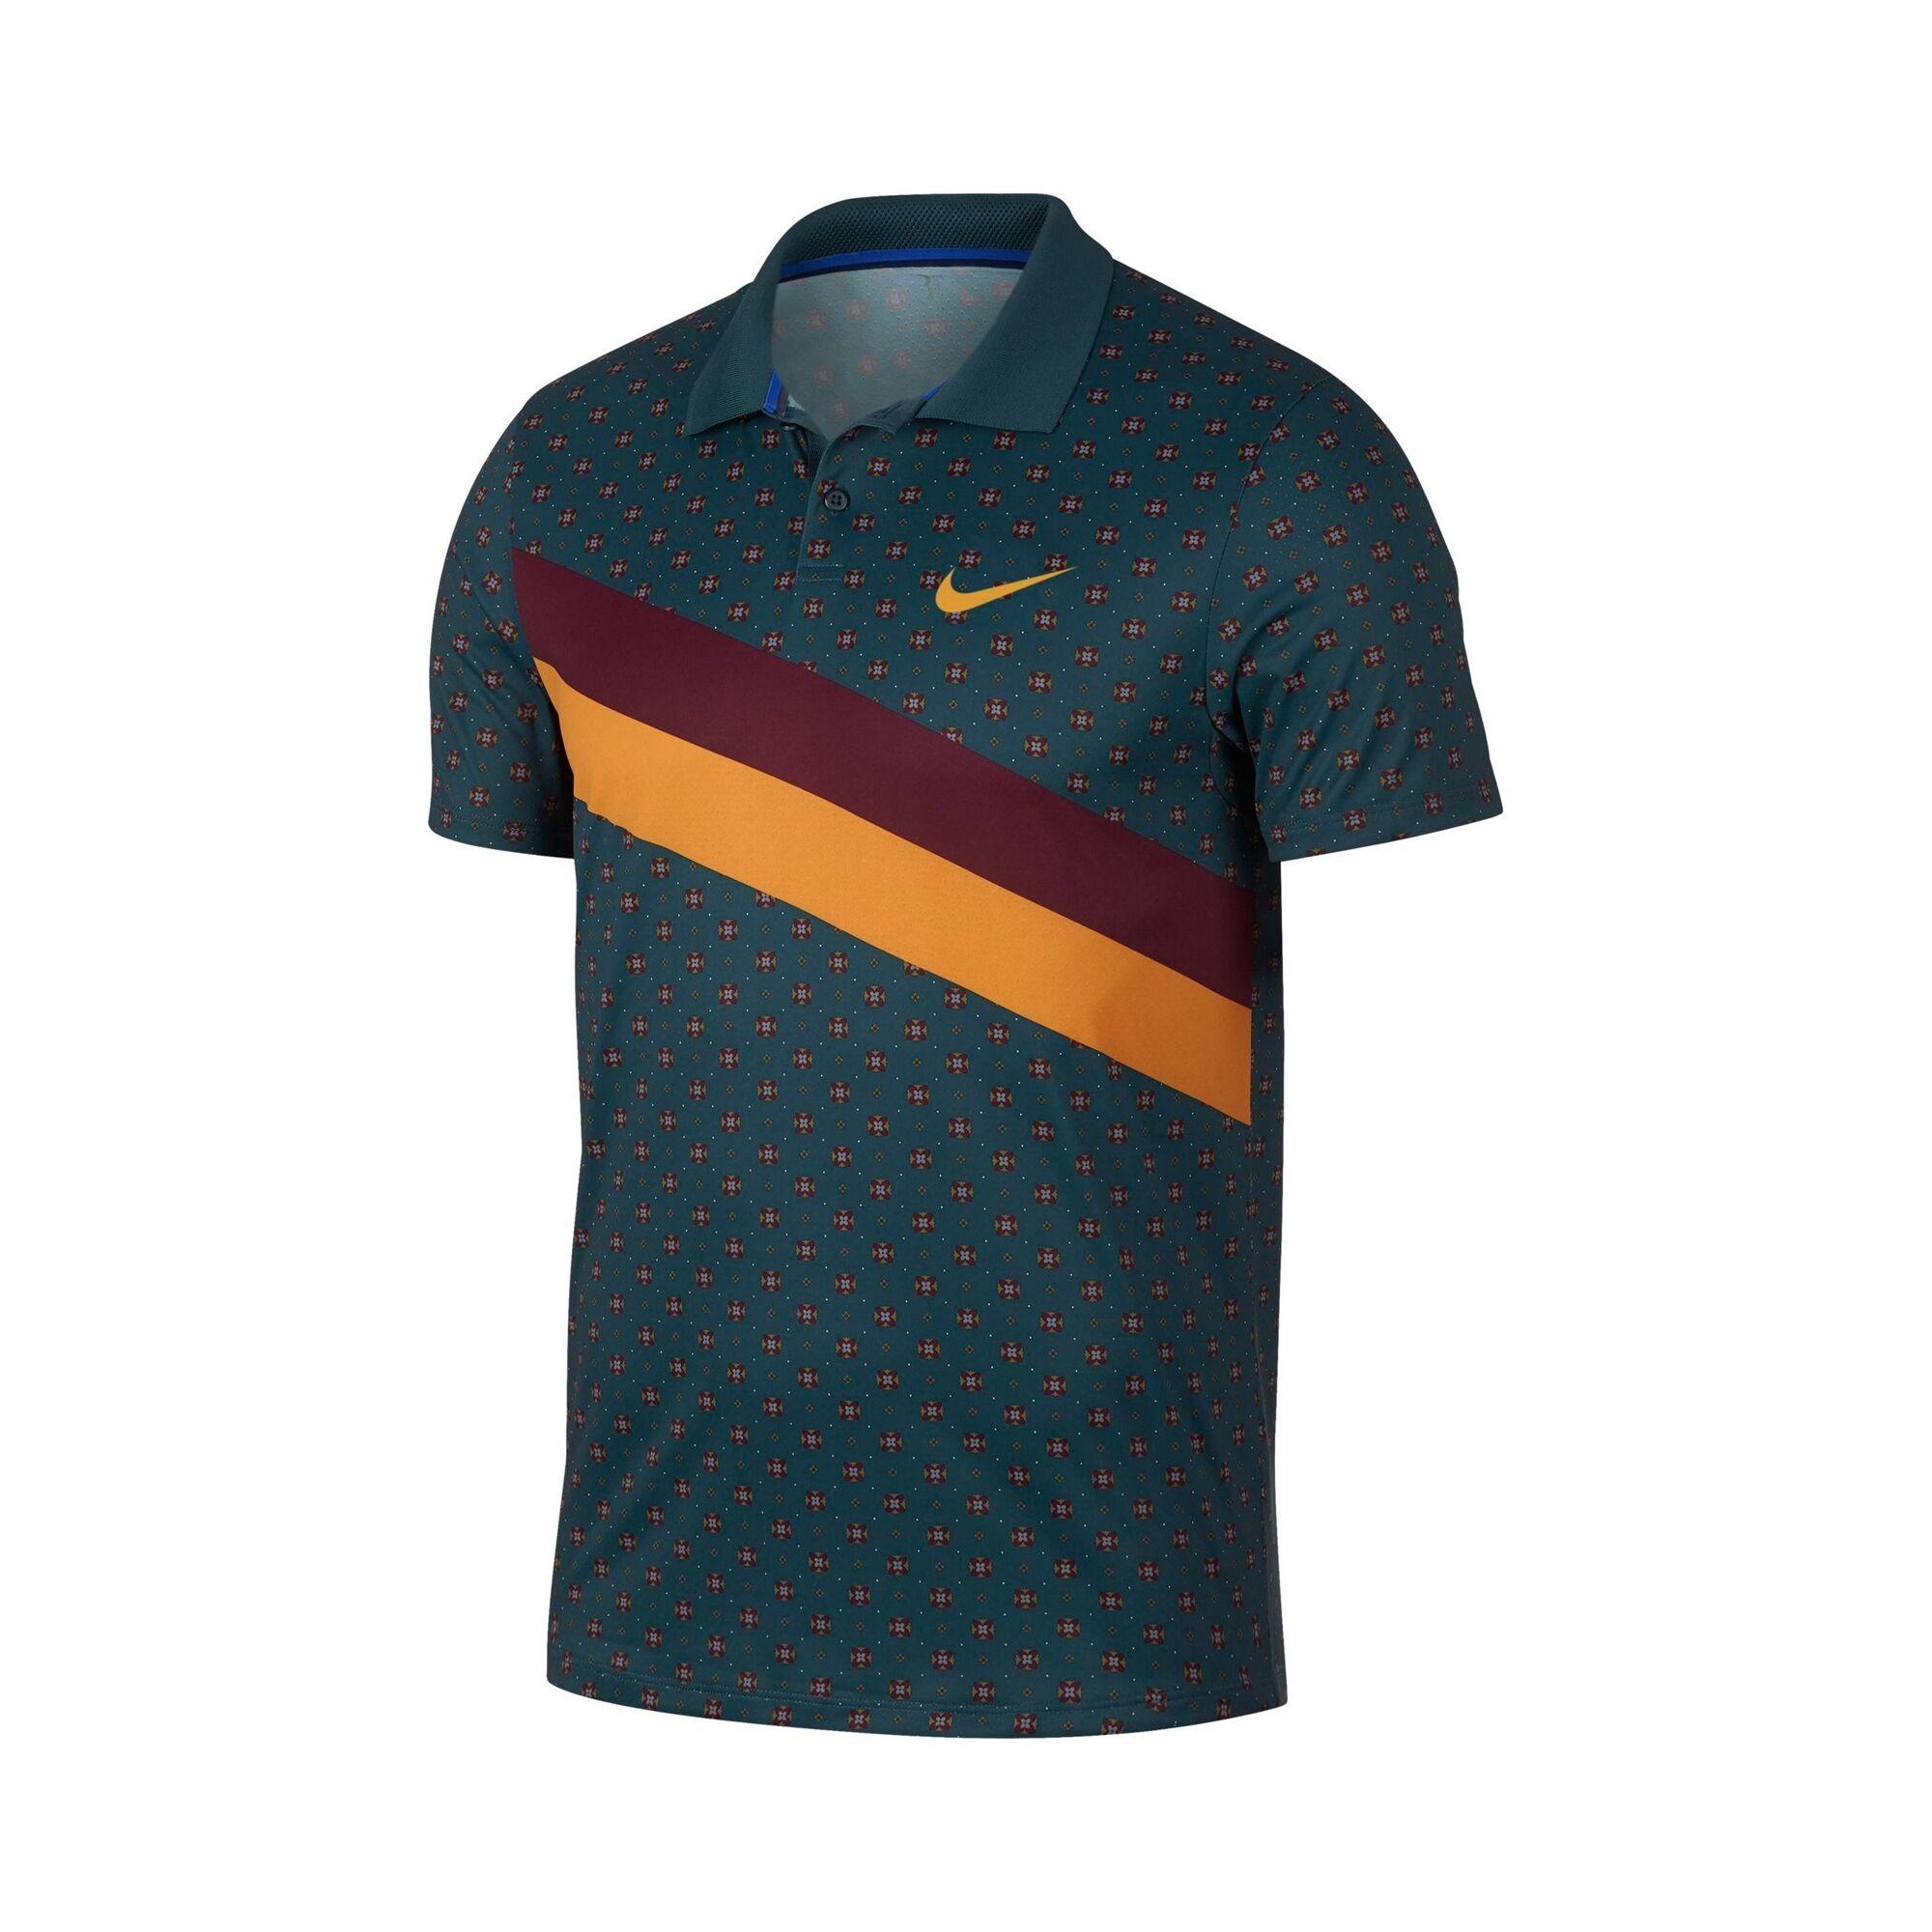 Nike Dri-Fit Polo Nightshade/Canyon Gold L